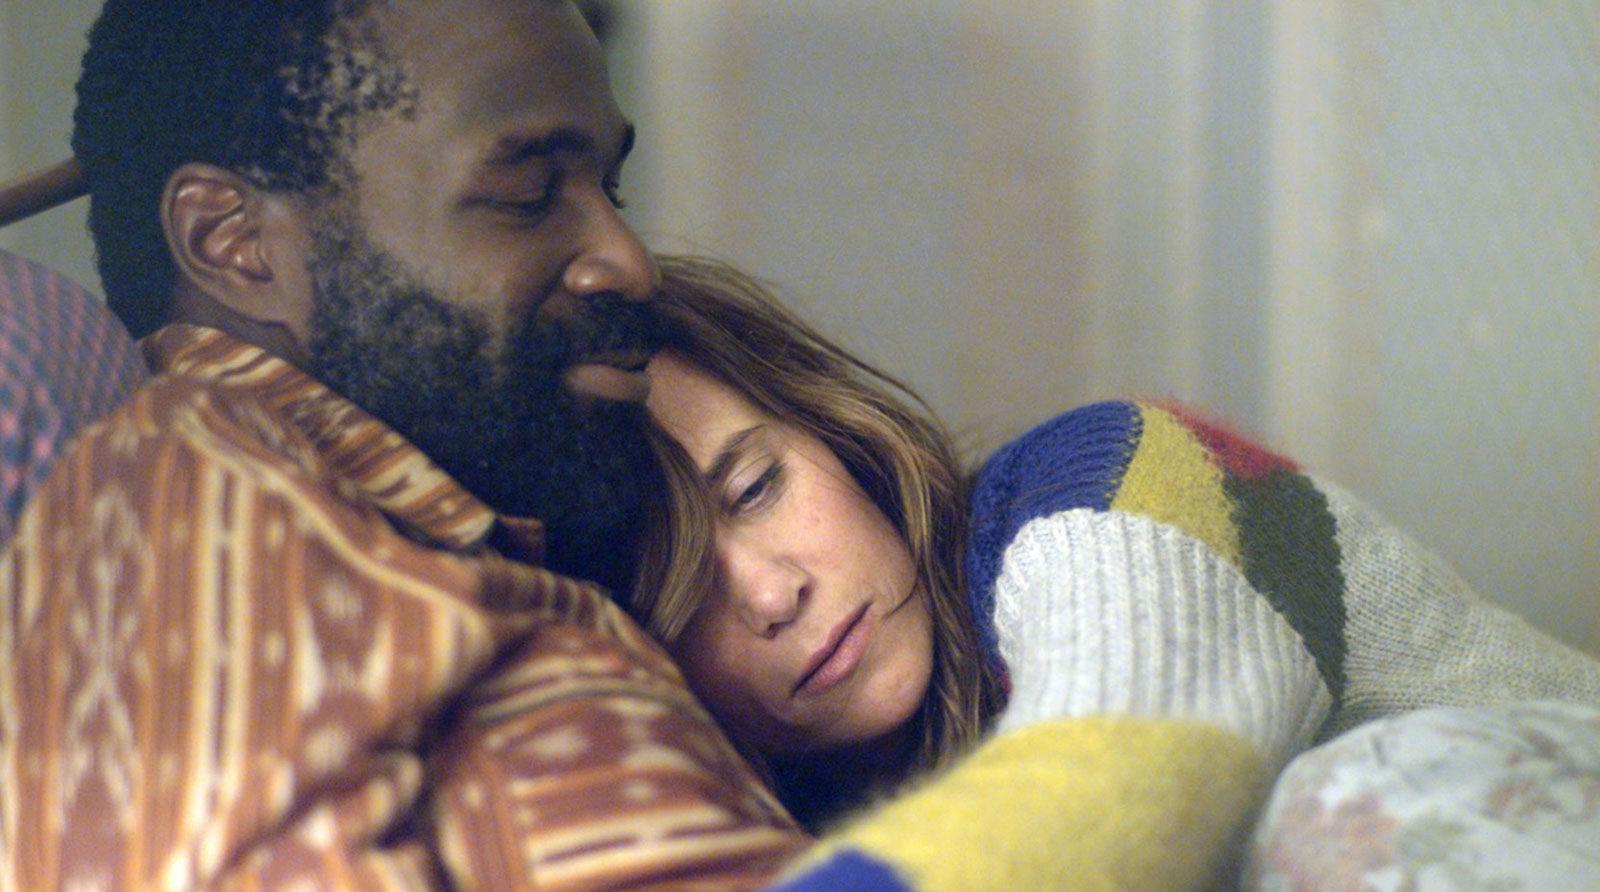 Tunde Adebimpe as Mo and Kristen Wiig as Polly, in Silva's Nasty Baby, 2015